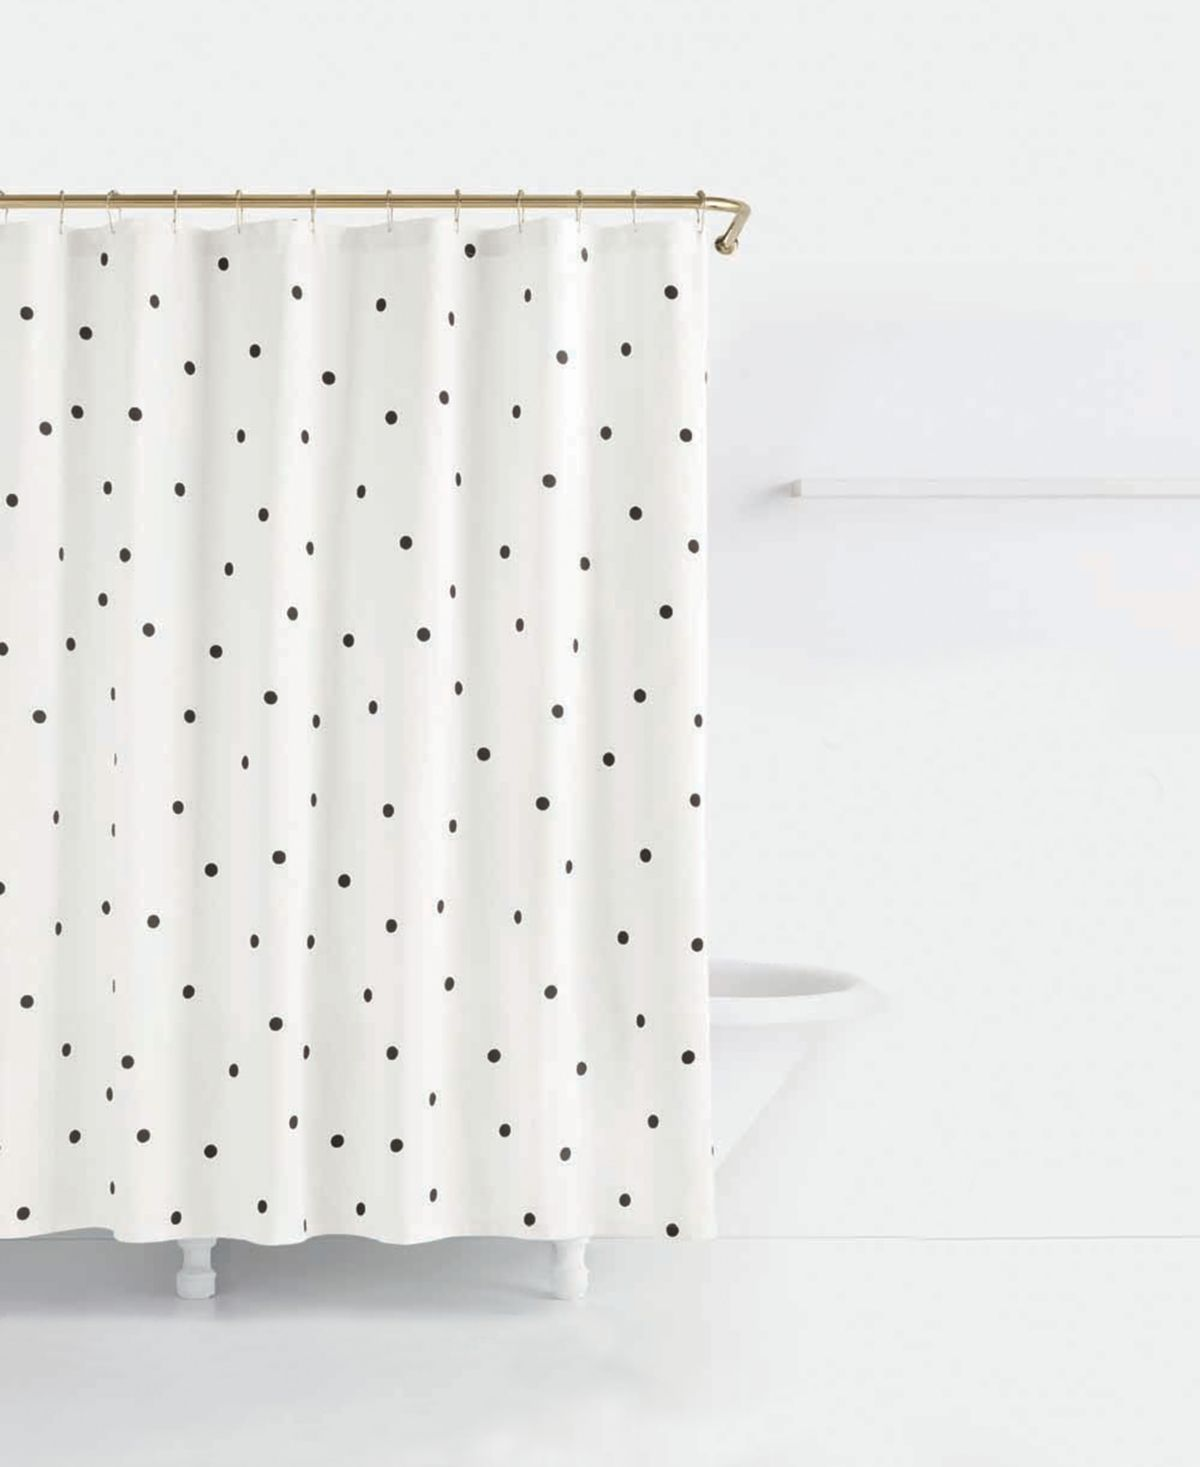 Kate Spade New York Deco Cotton Dot Print Shower Curtain Deco